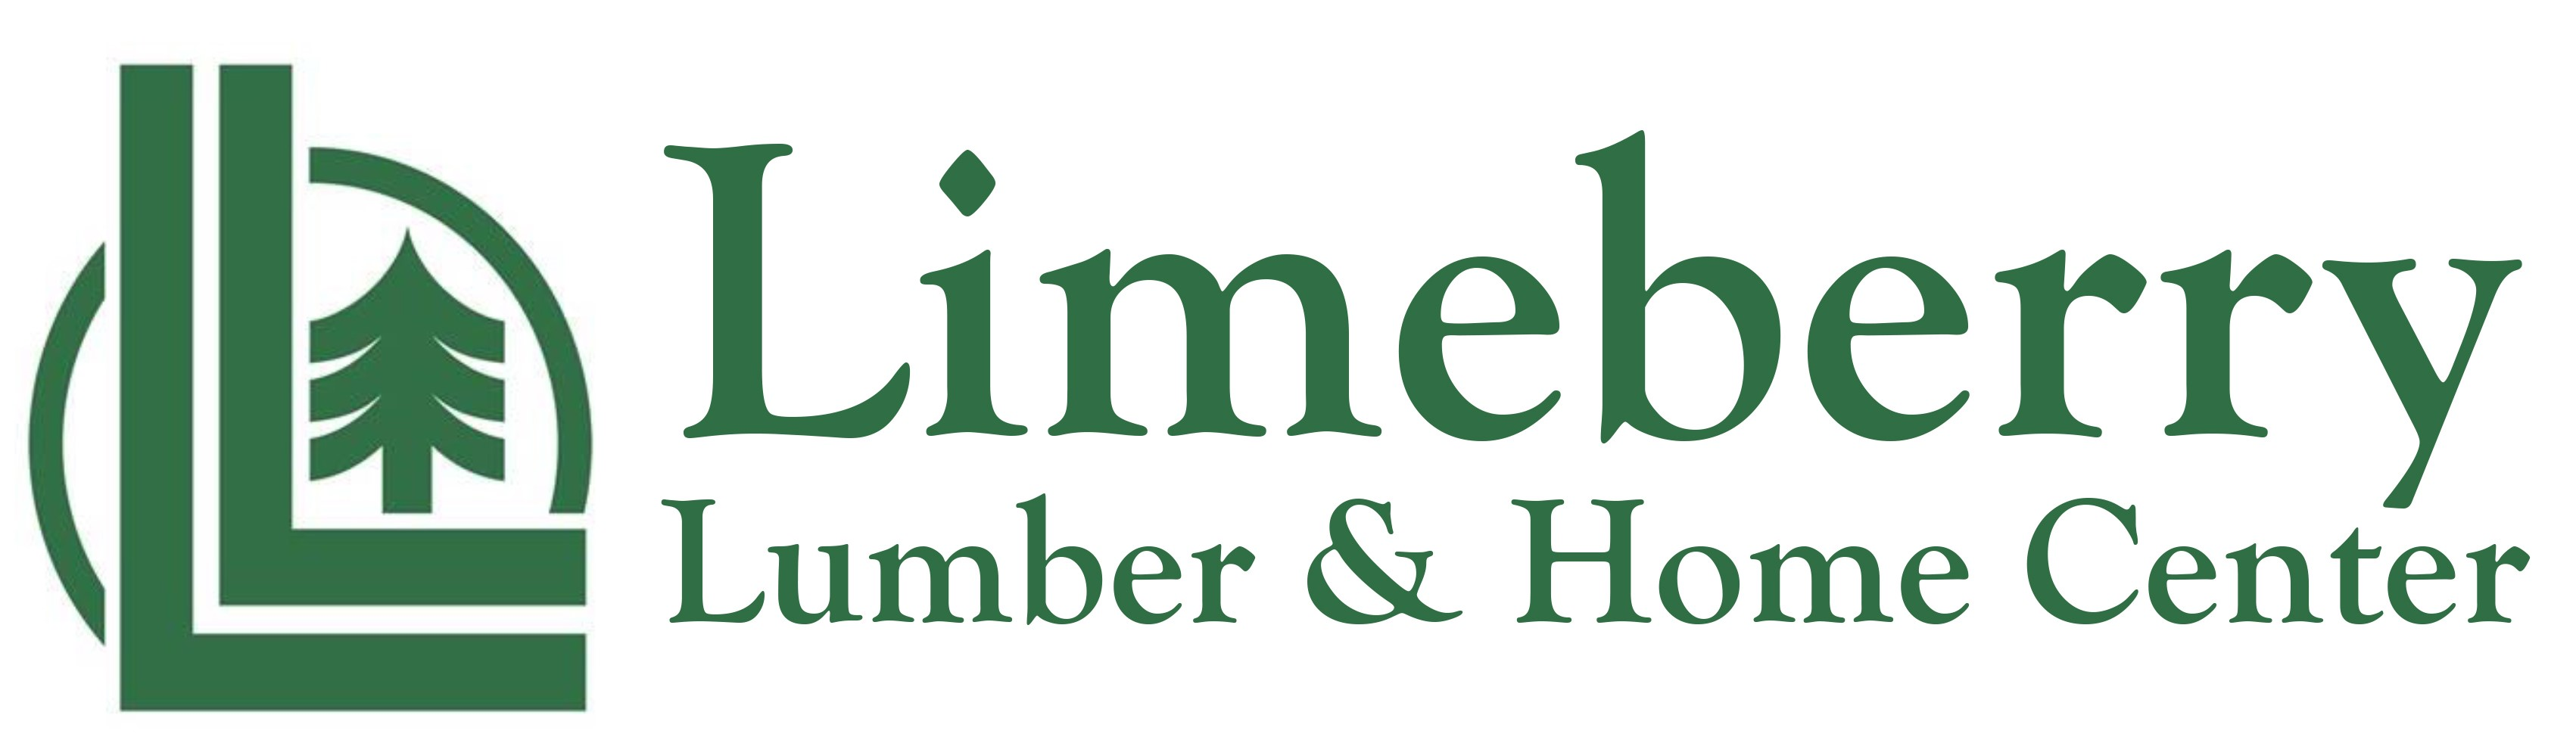 Limeberry Lumber